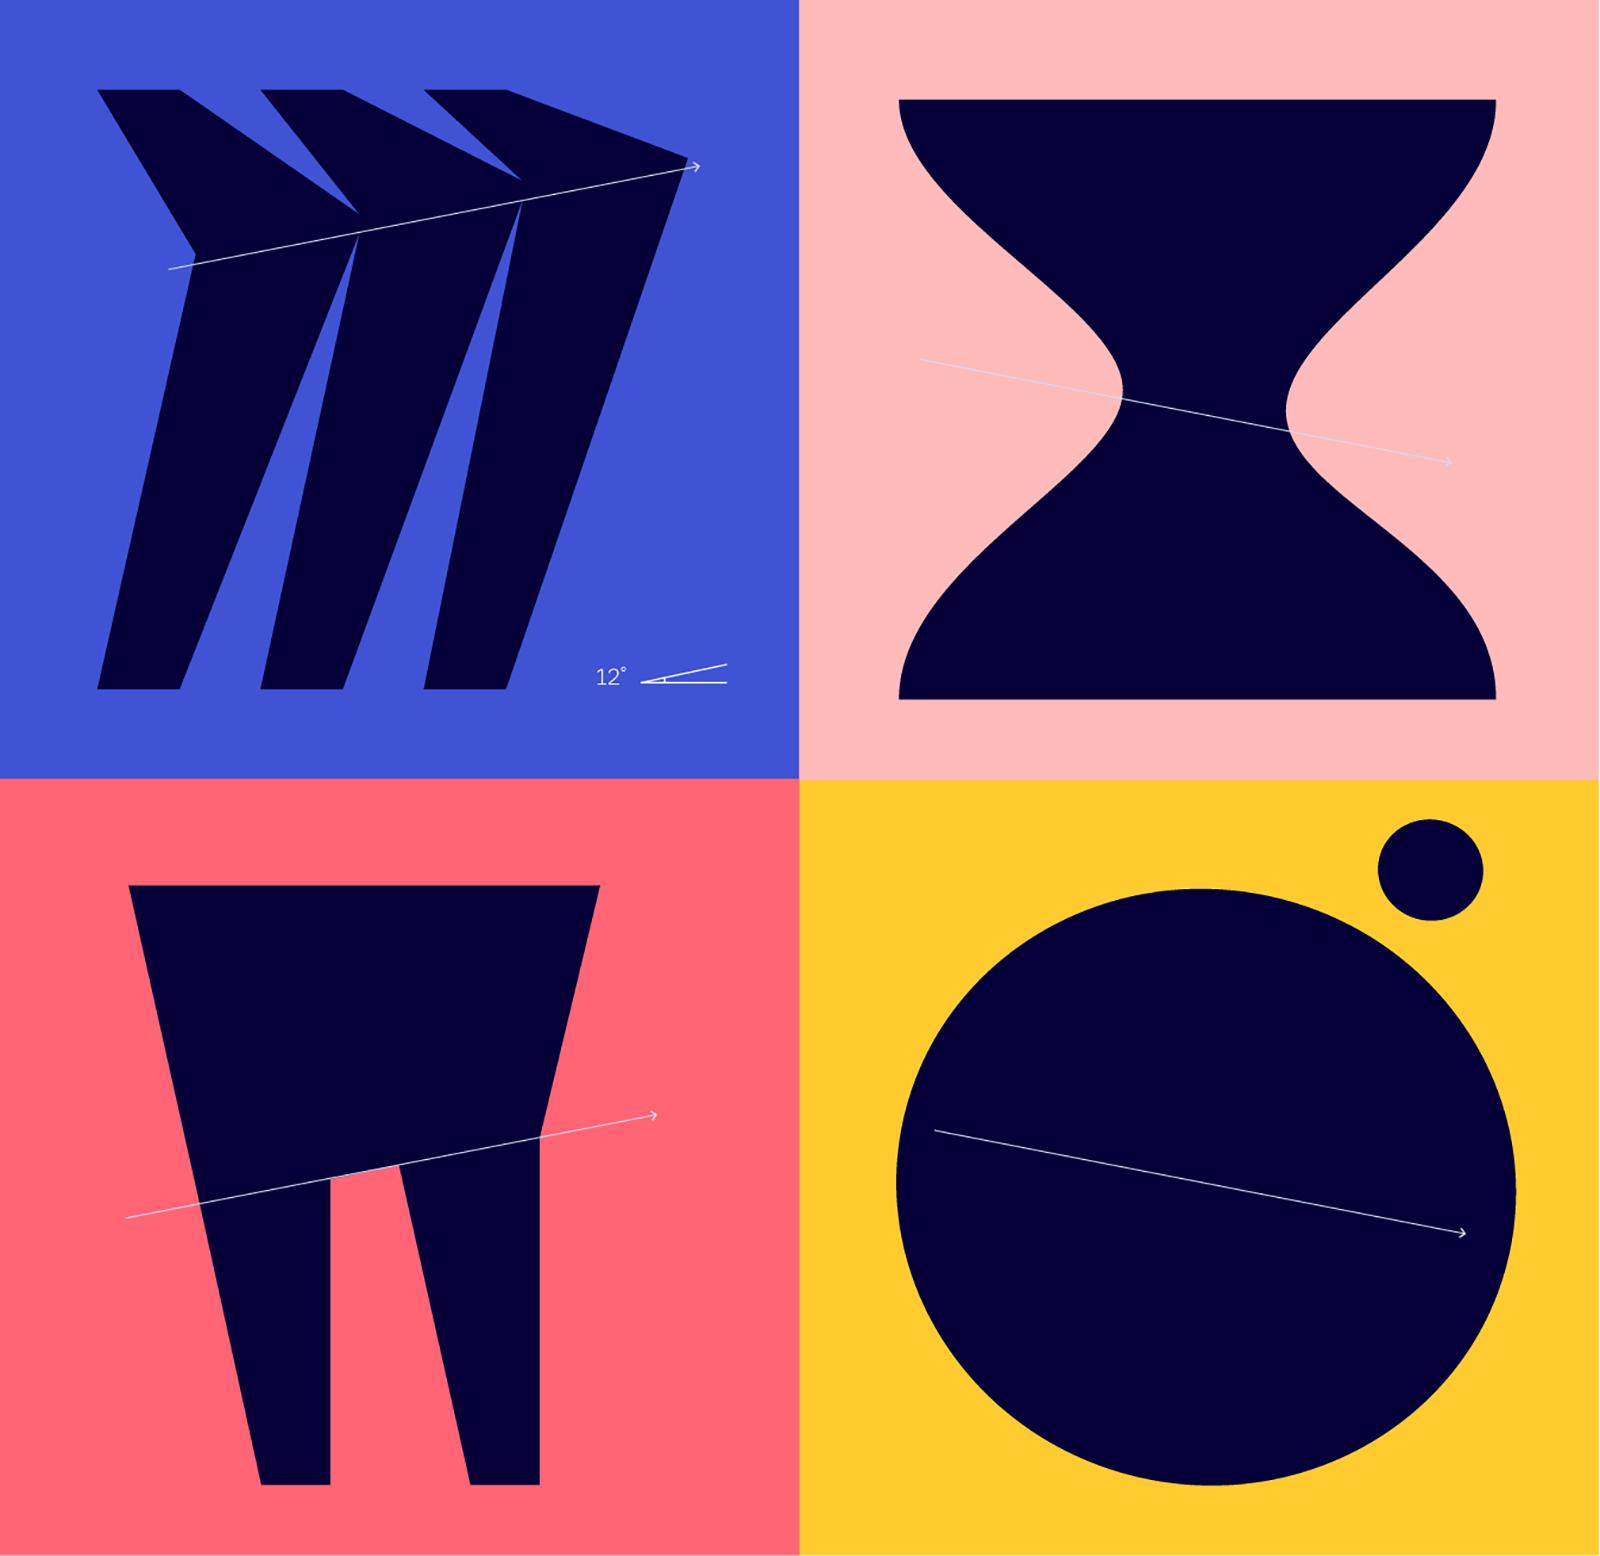 RealtimeBoard更名miro并启用全新的品牌logo和vi形象设计-深圳vi设计4